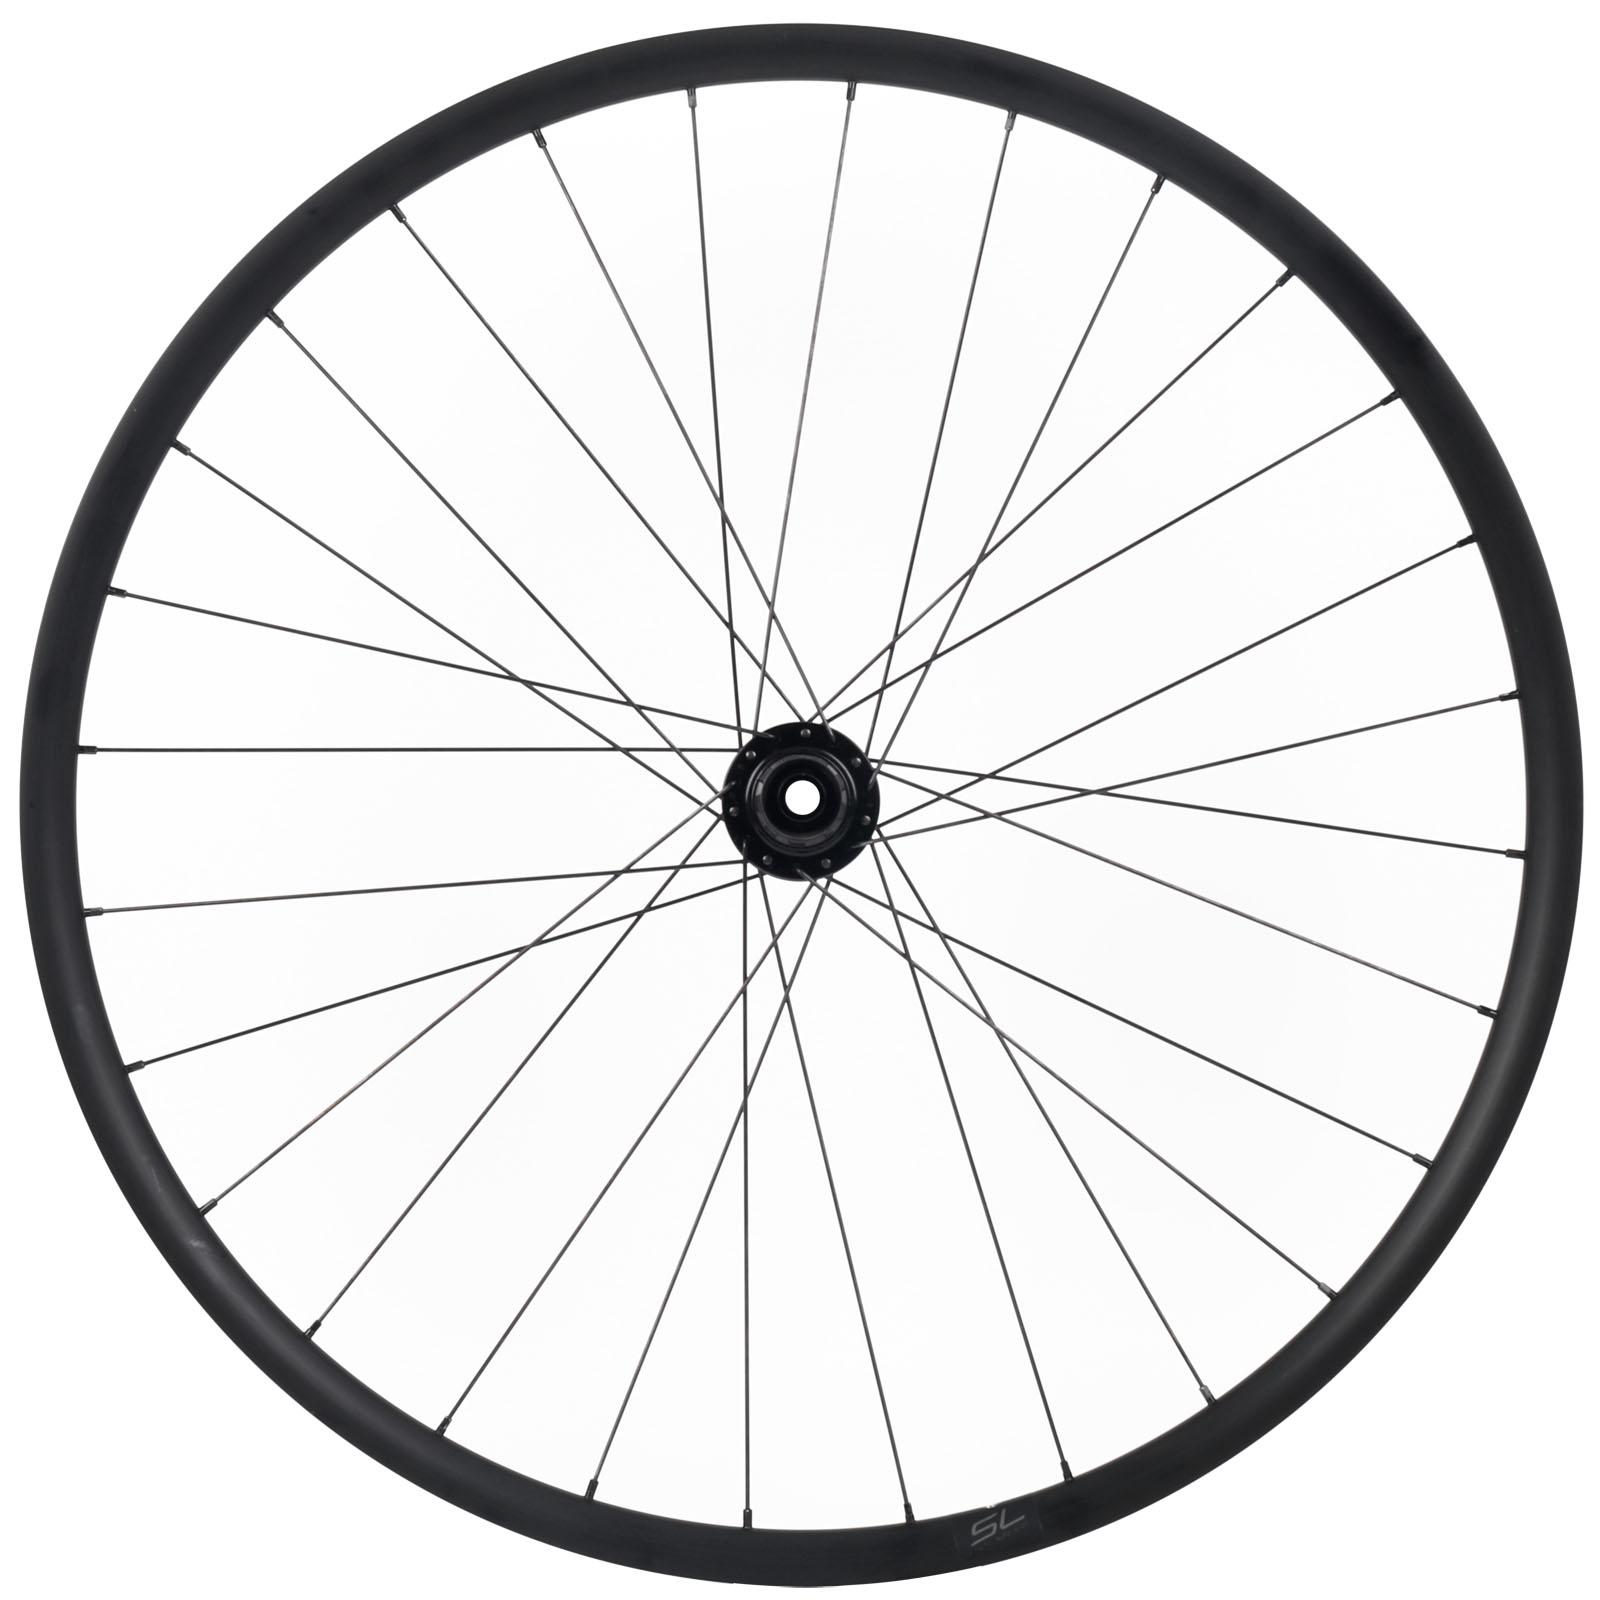 Picture of Specialized Vado SL 4.0 28 Inch Rear Wheel - Centerlock - 12x148mm